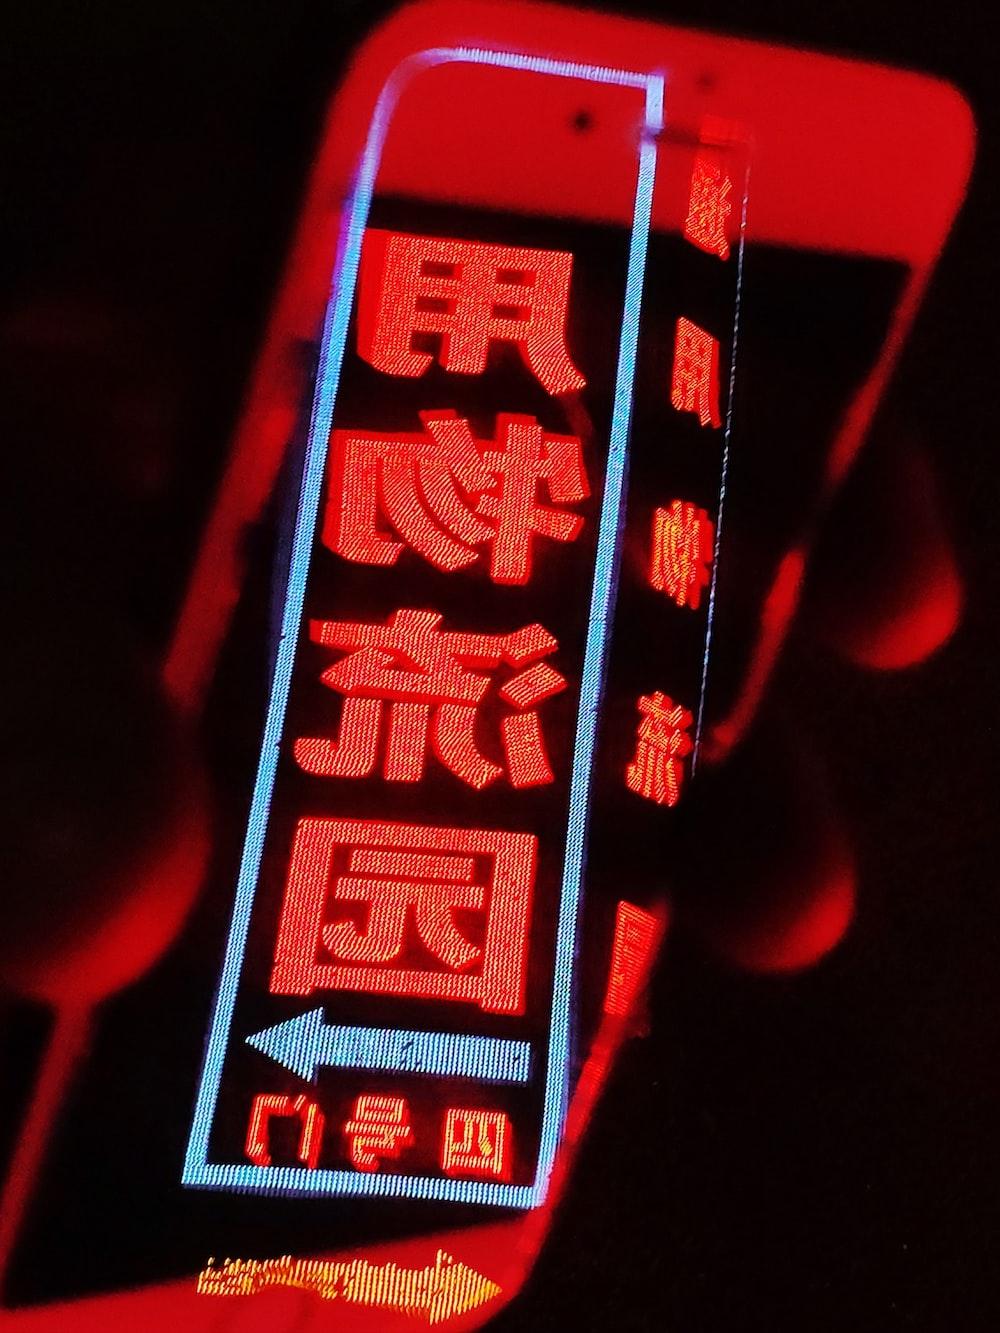 red Kanji text